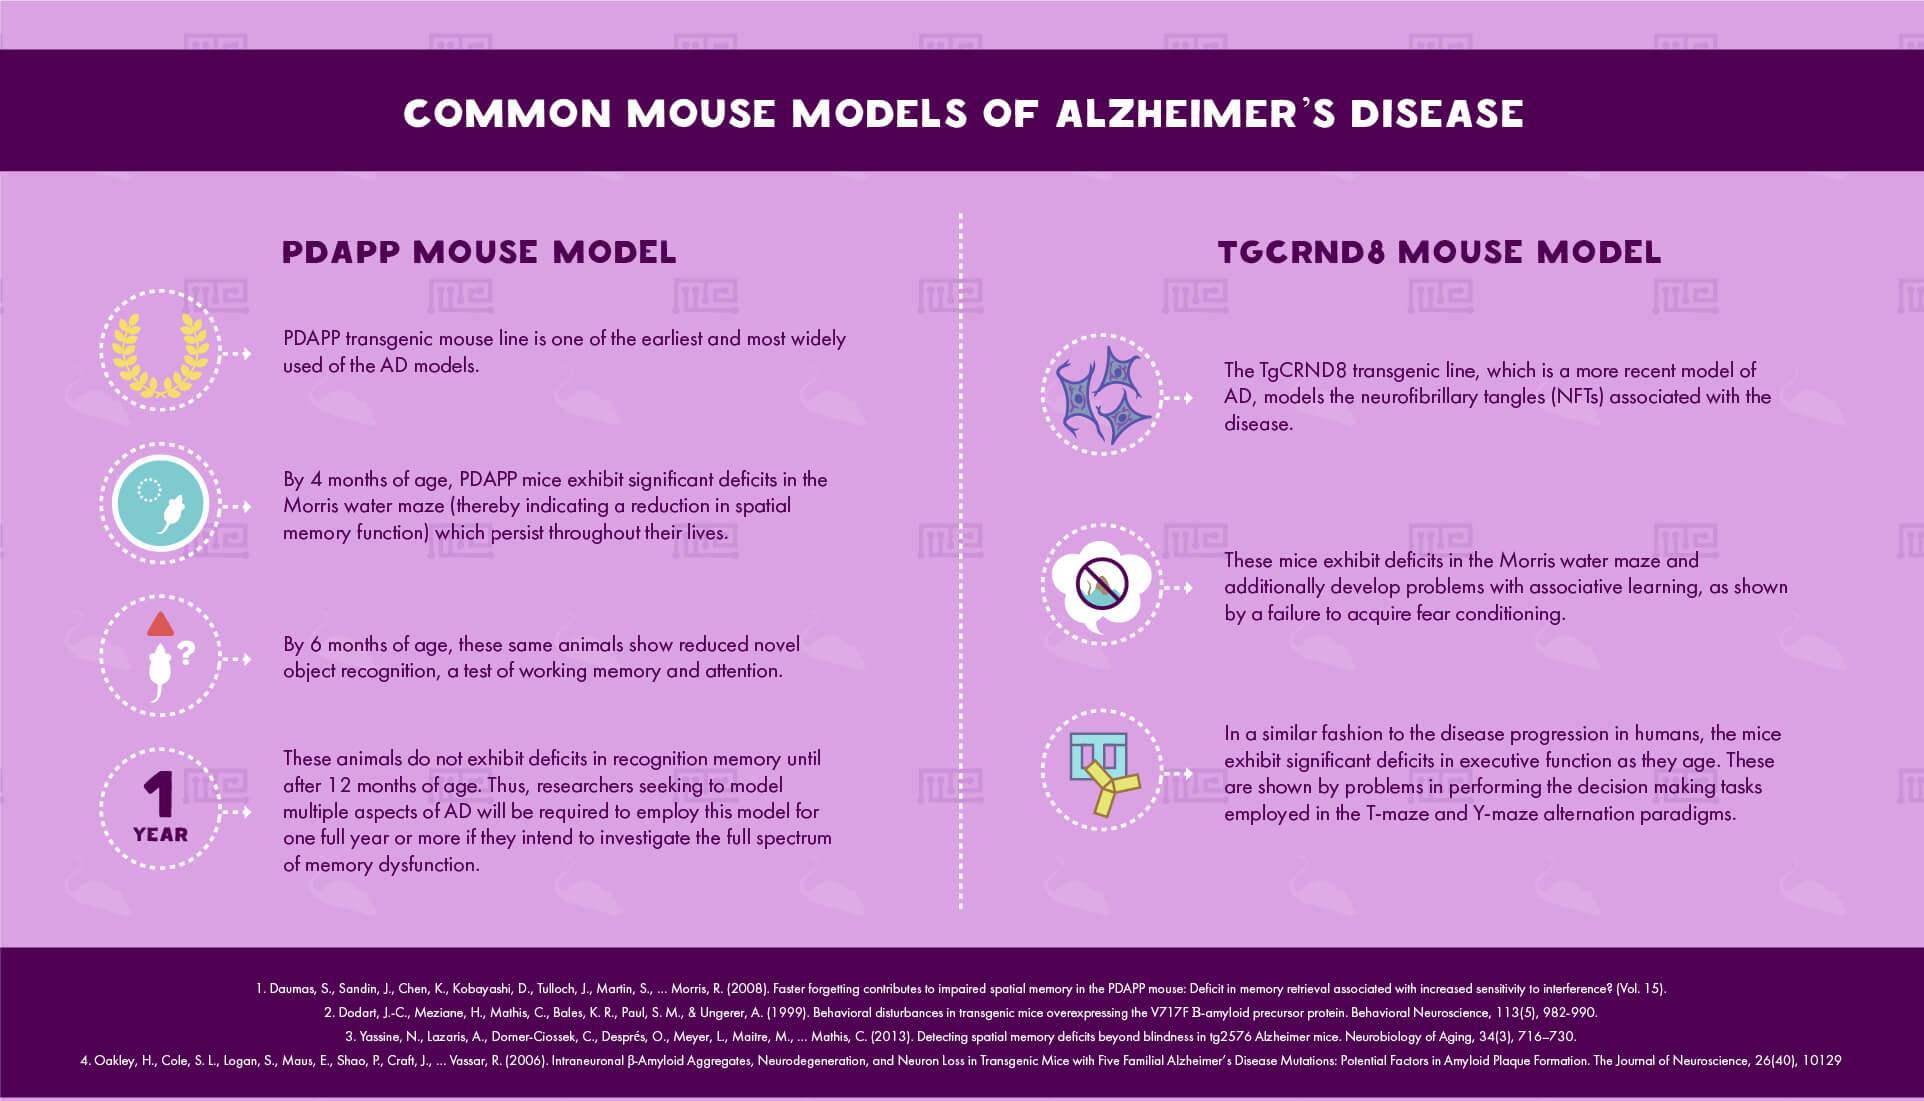 Common mouse models of Alzheimer's Disease